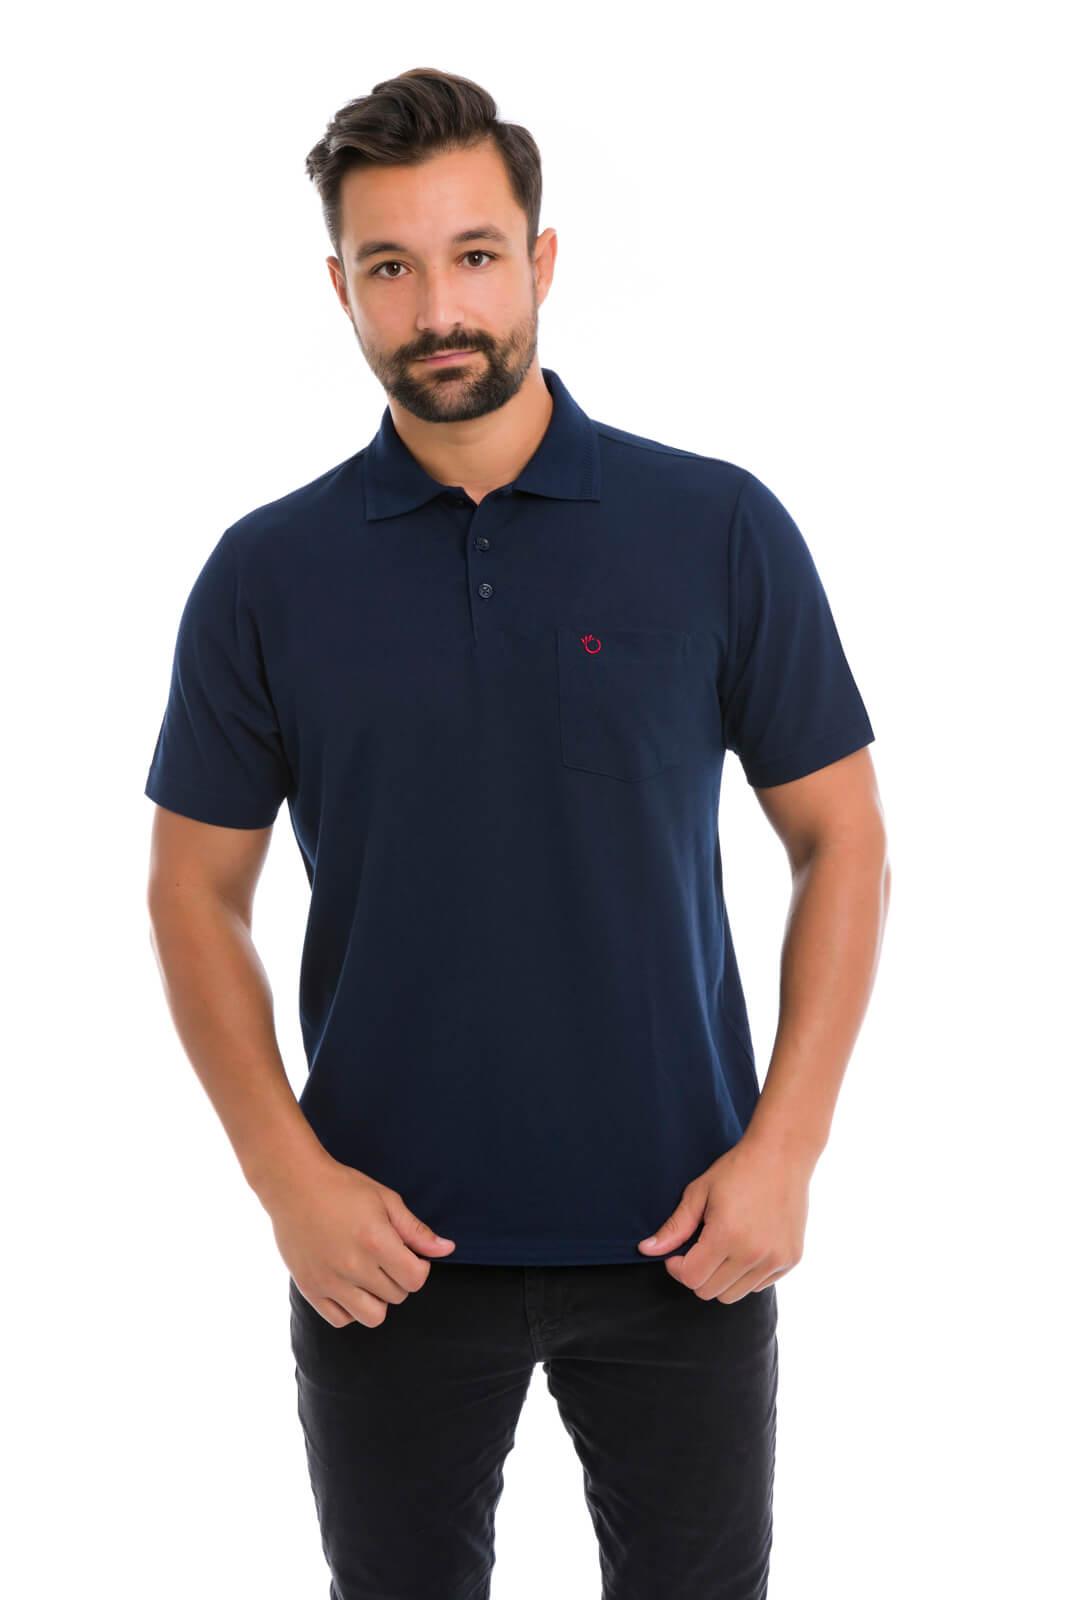 Camisa Gola Polo Olimpo Piquet Liso com Bolso